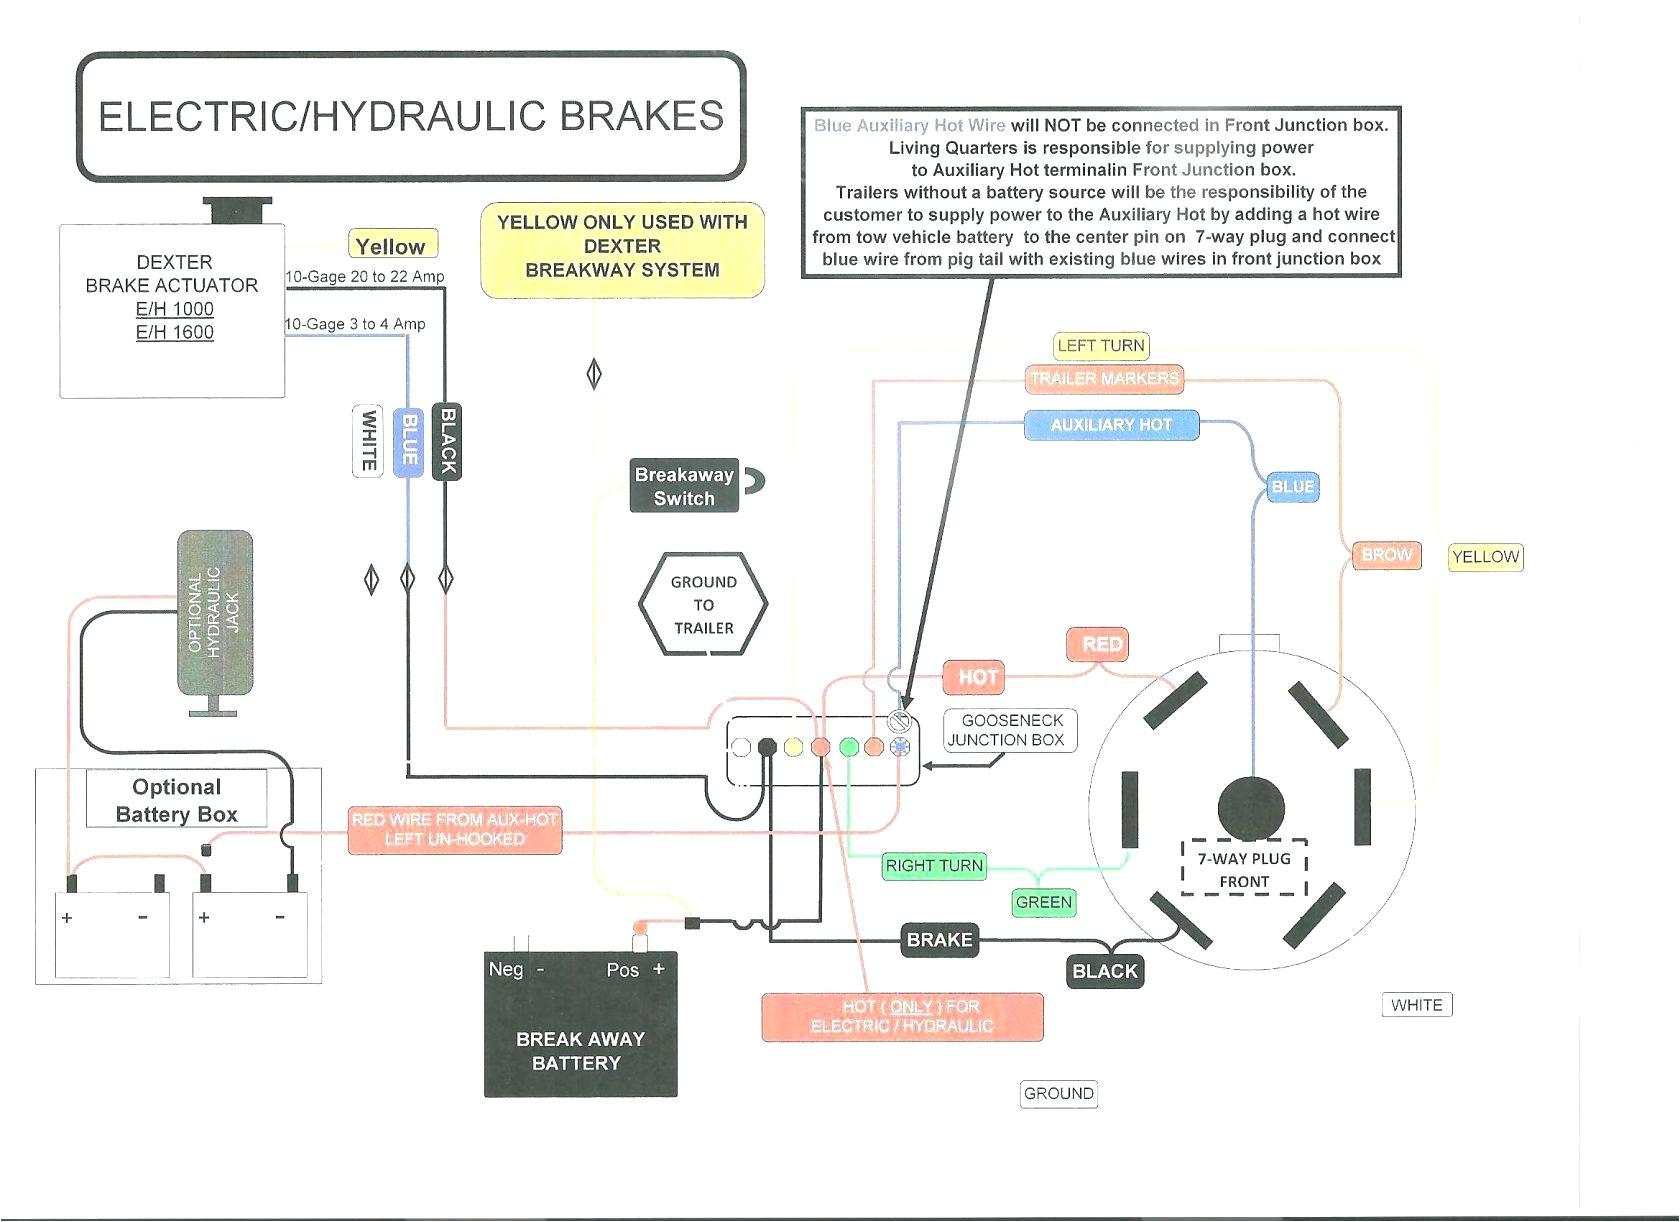 dexter trailer brakes wiring diagram new trailer brake wiring diagram 2018 wabco wiring schematic data wiring